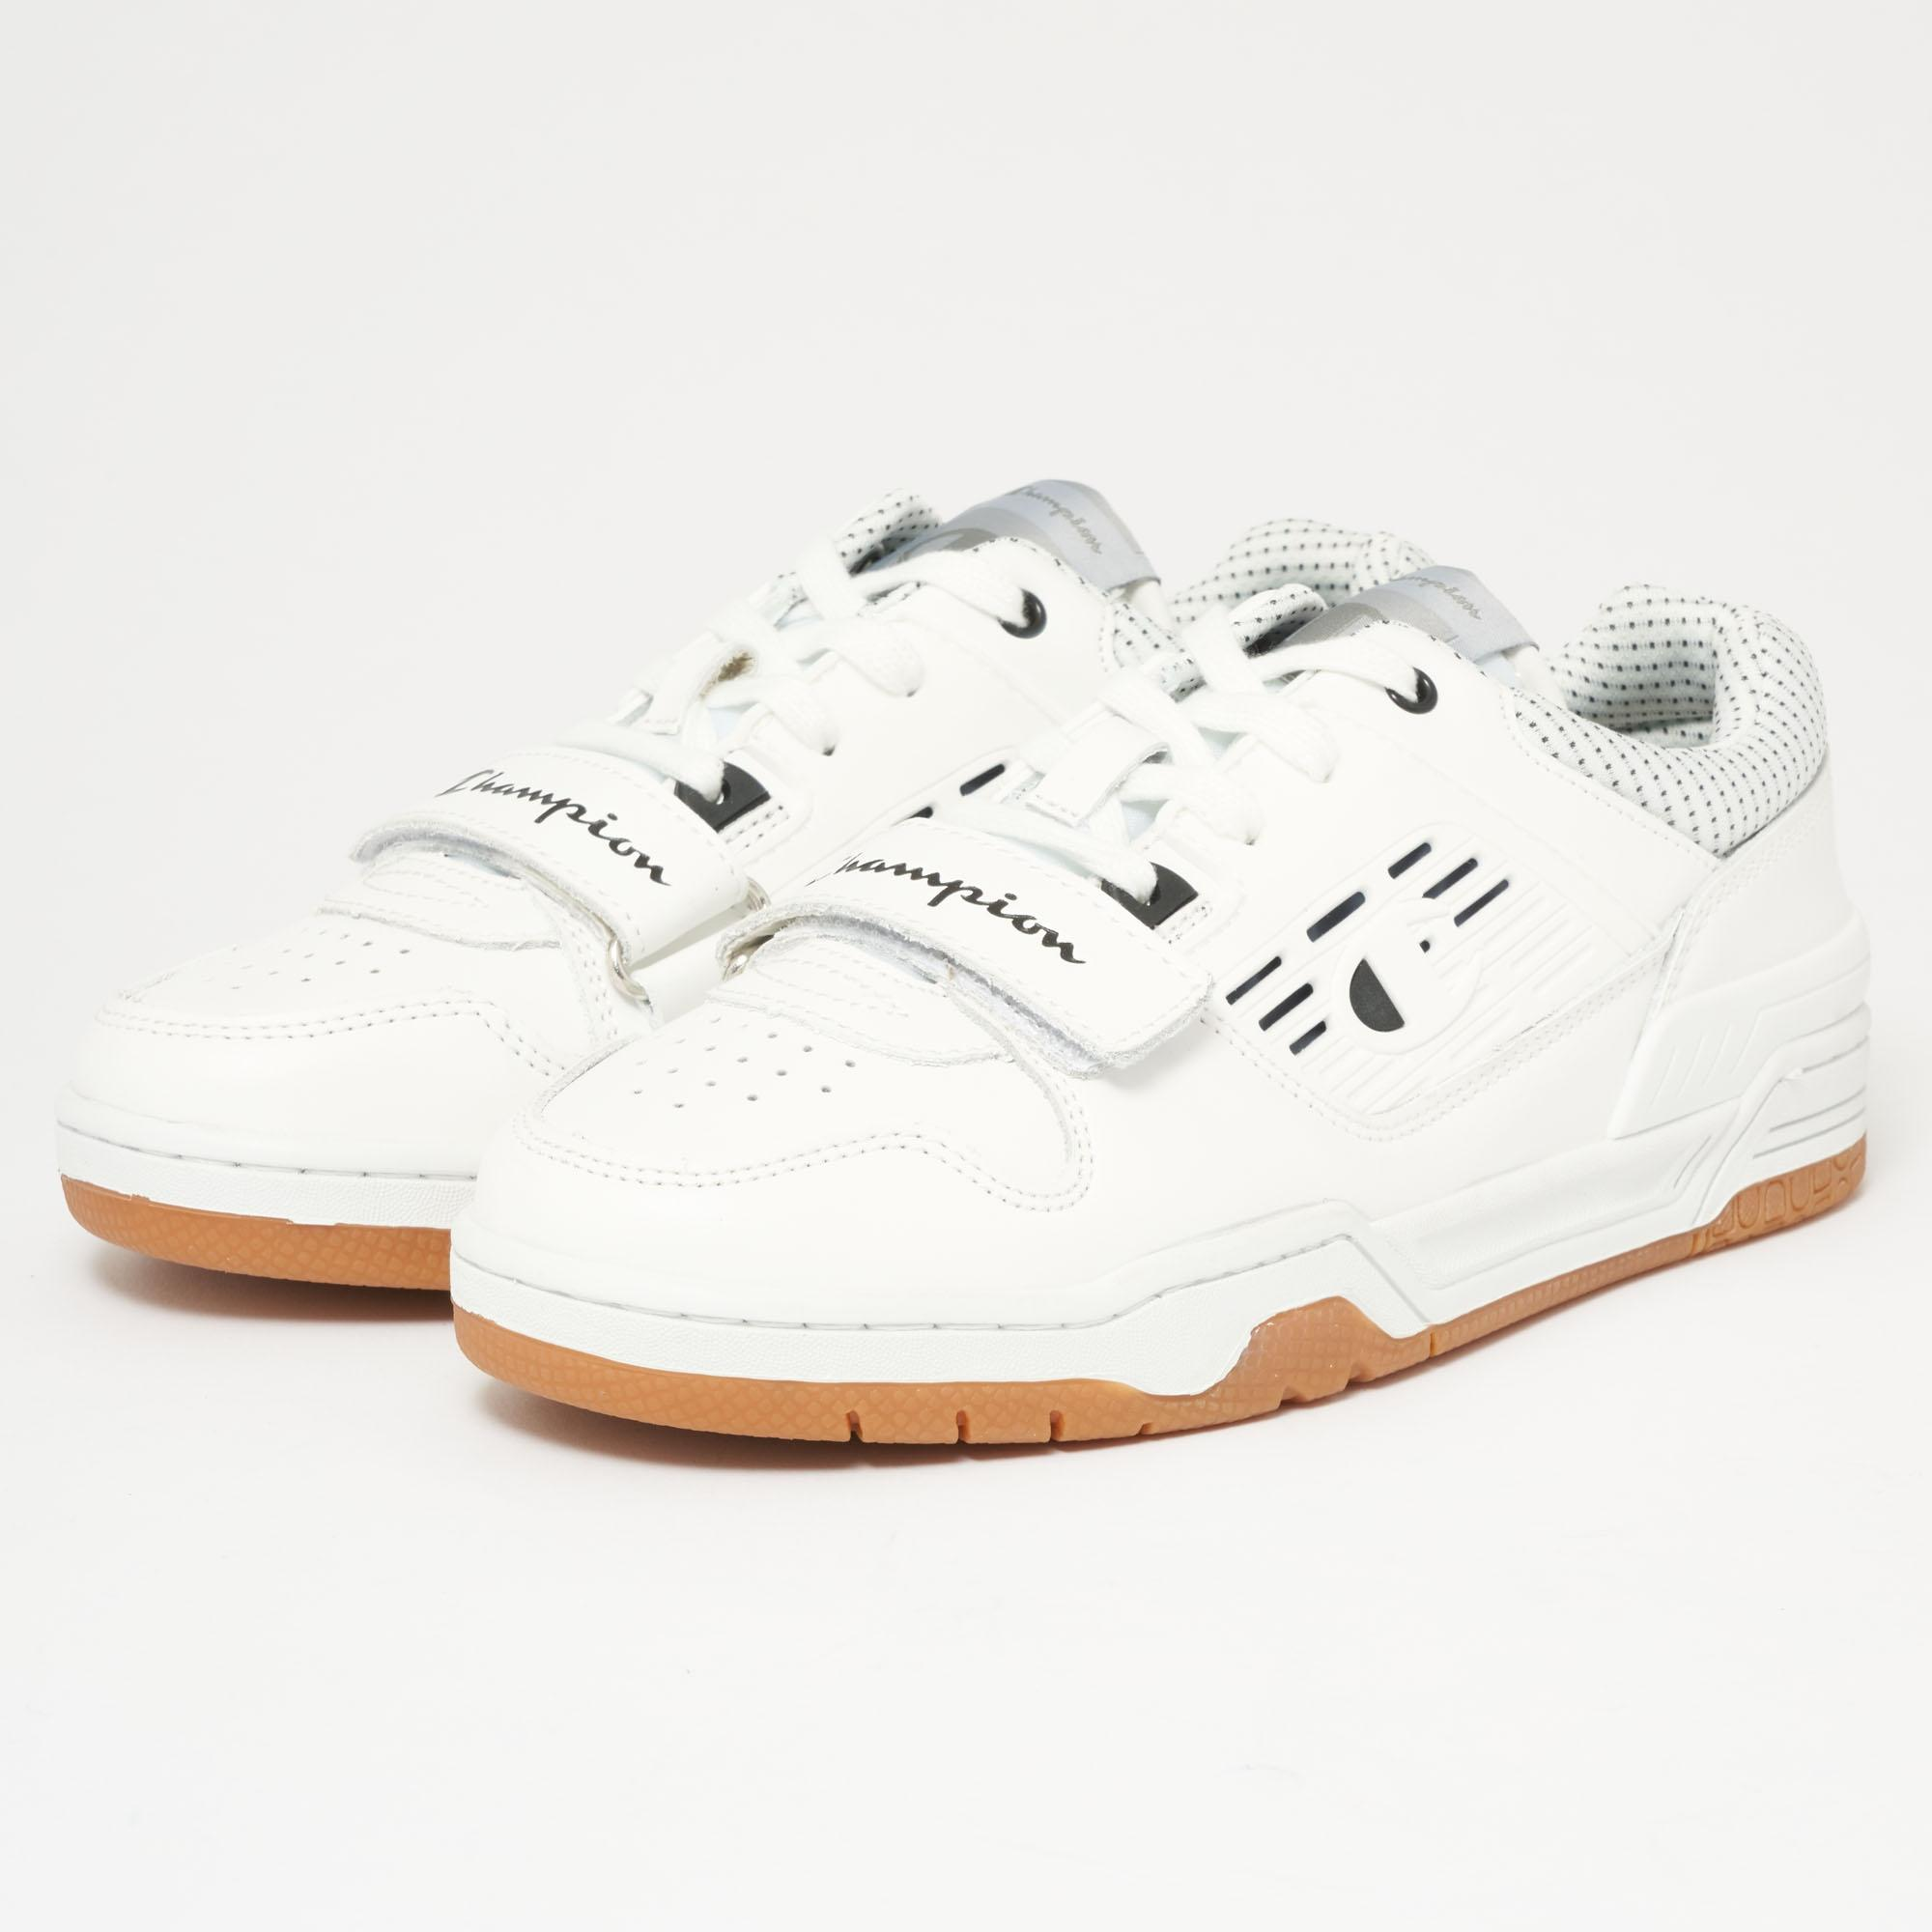 5ef5f86e80552 Champion 3 On 3 Low Sneaker - White in White for Men - Lyst